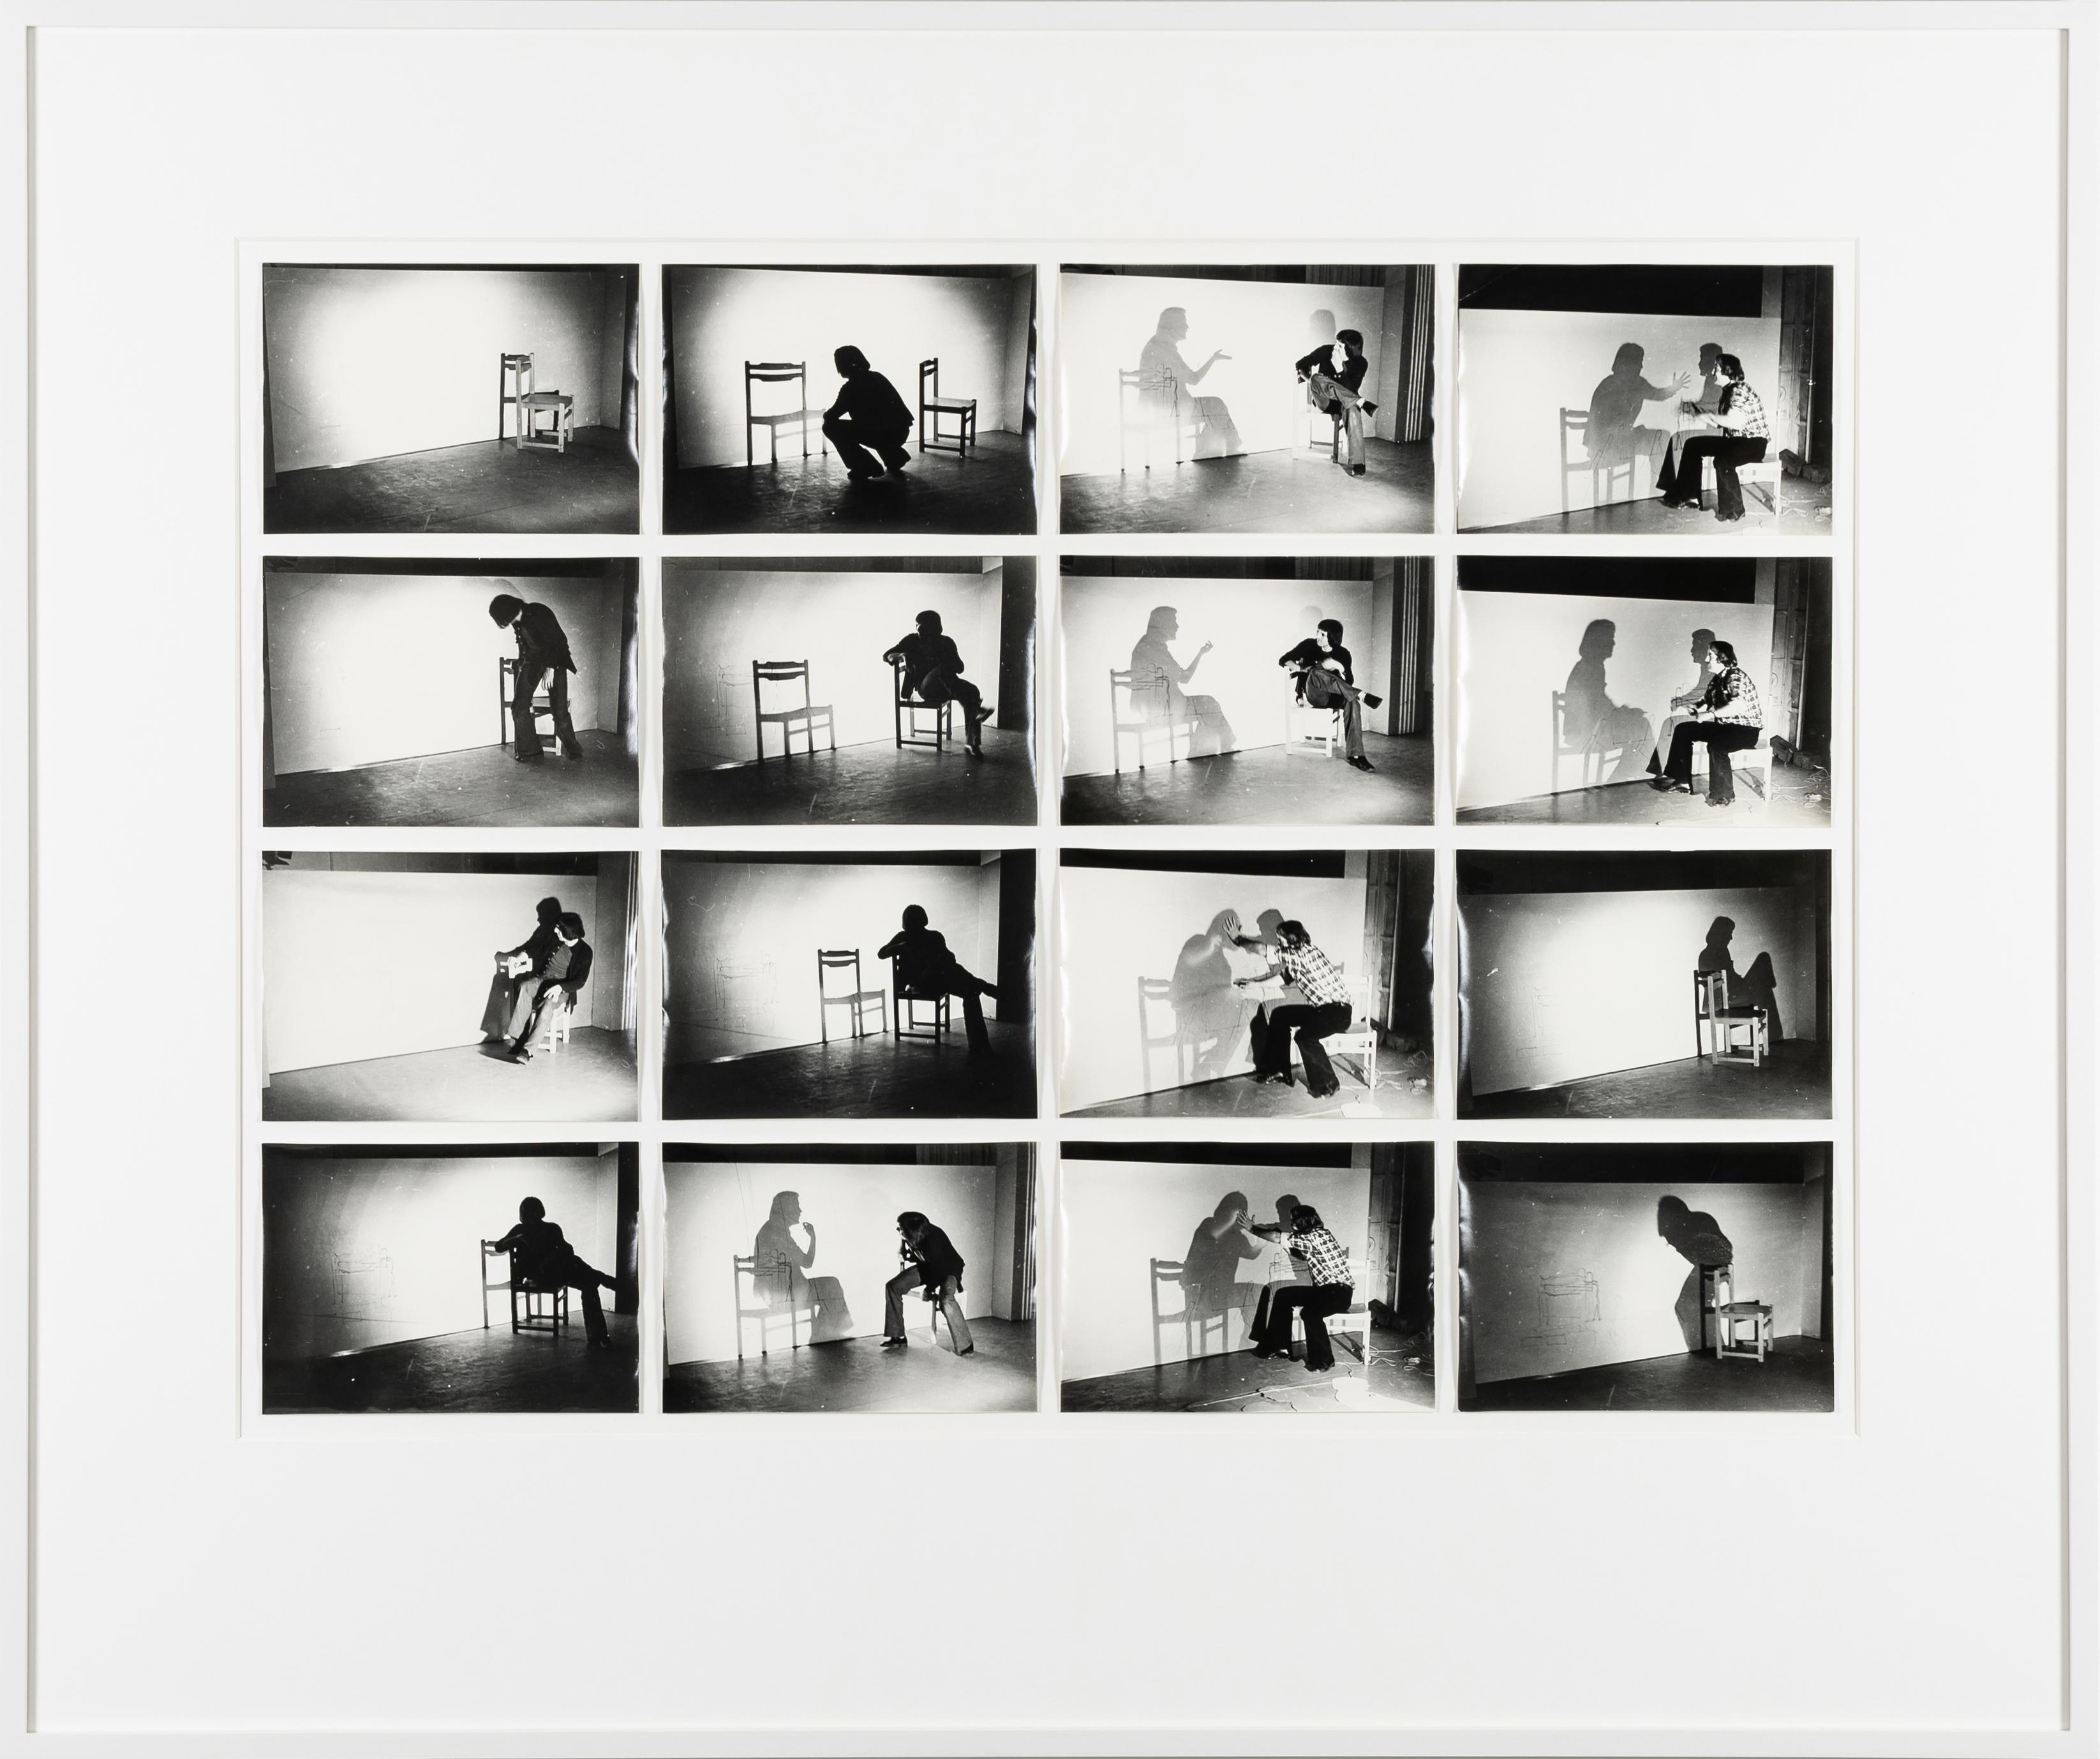 Ferenc Ficzek, Shadowchange, ca. 1977, silver gelatin print, 16 prints, 13 x 18 cm each. Photo: Jan Hecl